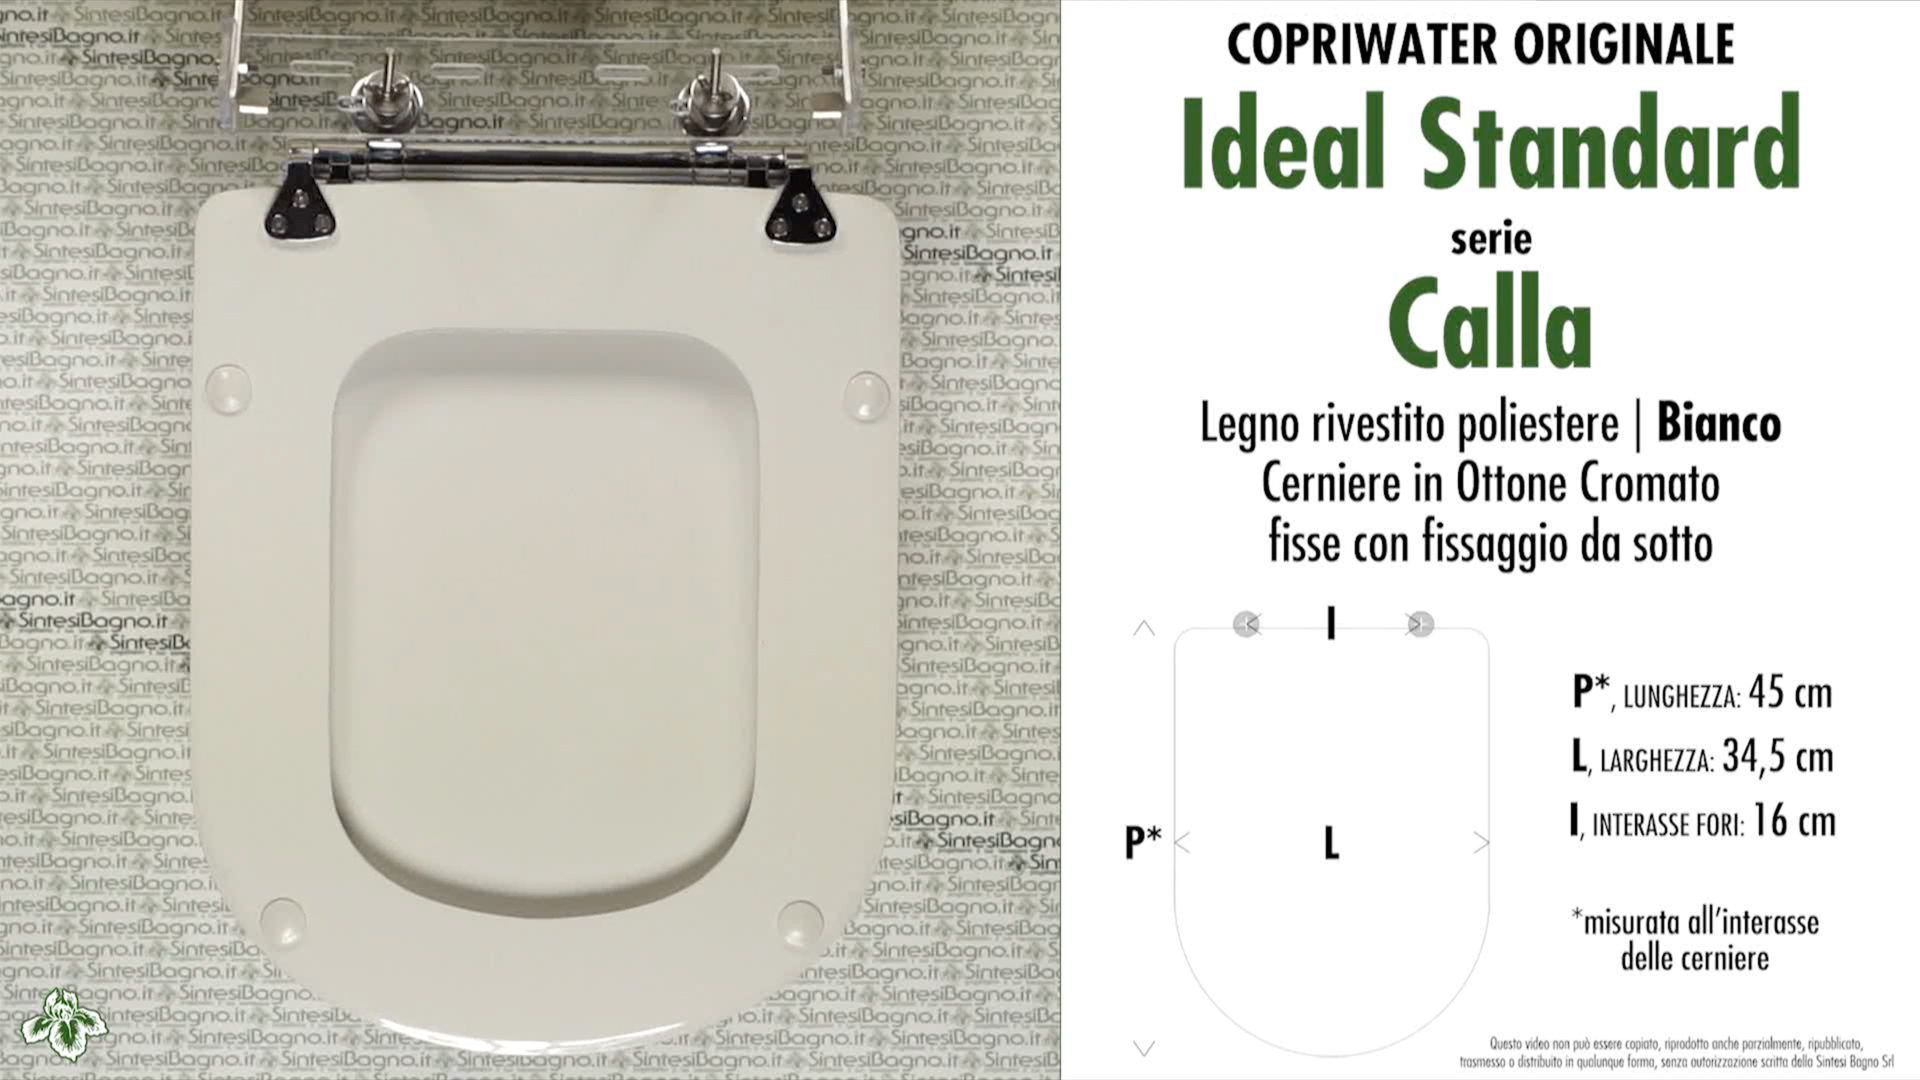 schede tecniche misure copriwater ideal standard serie calla